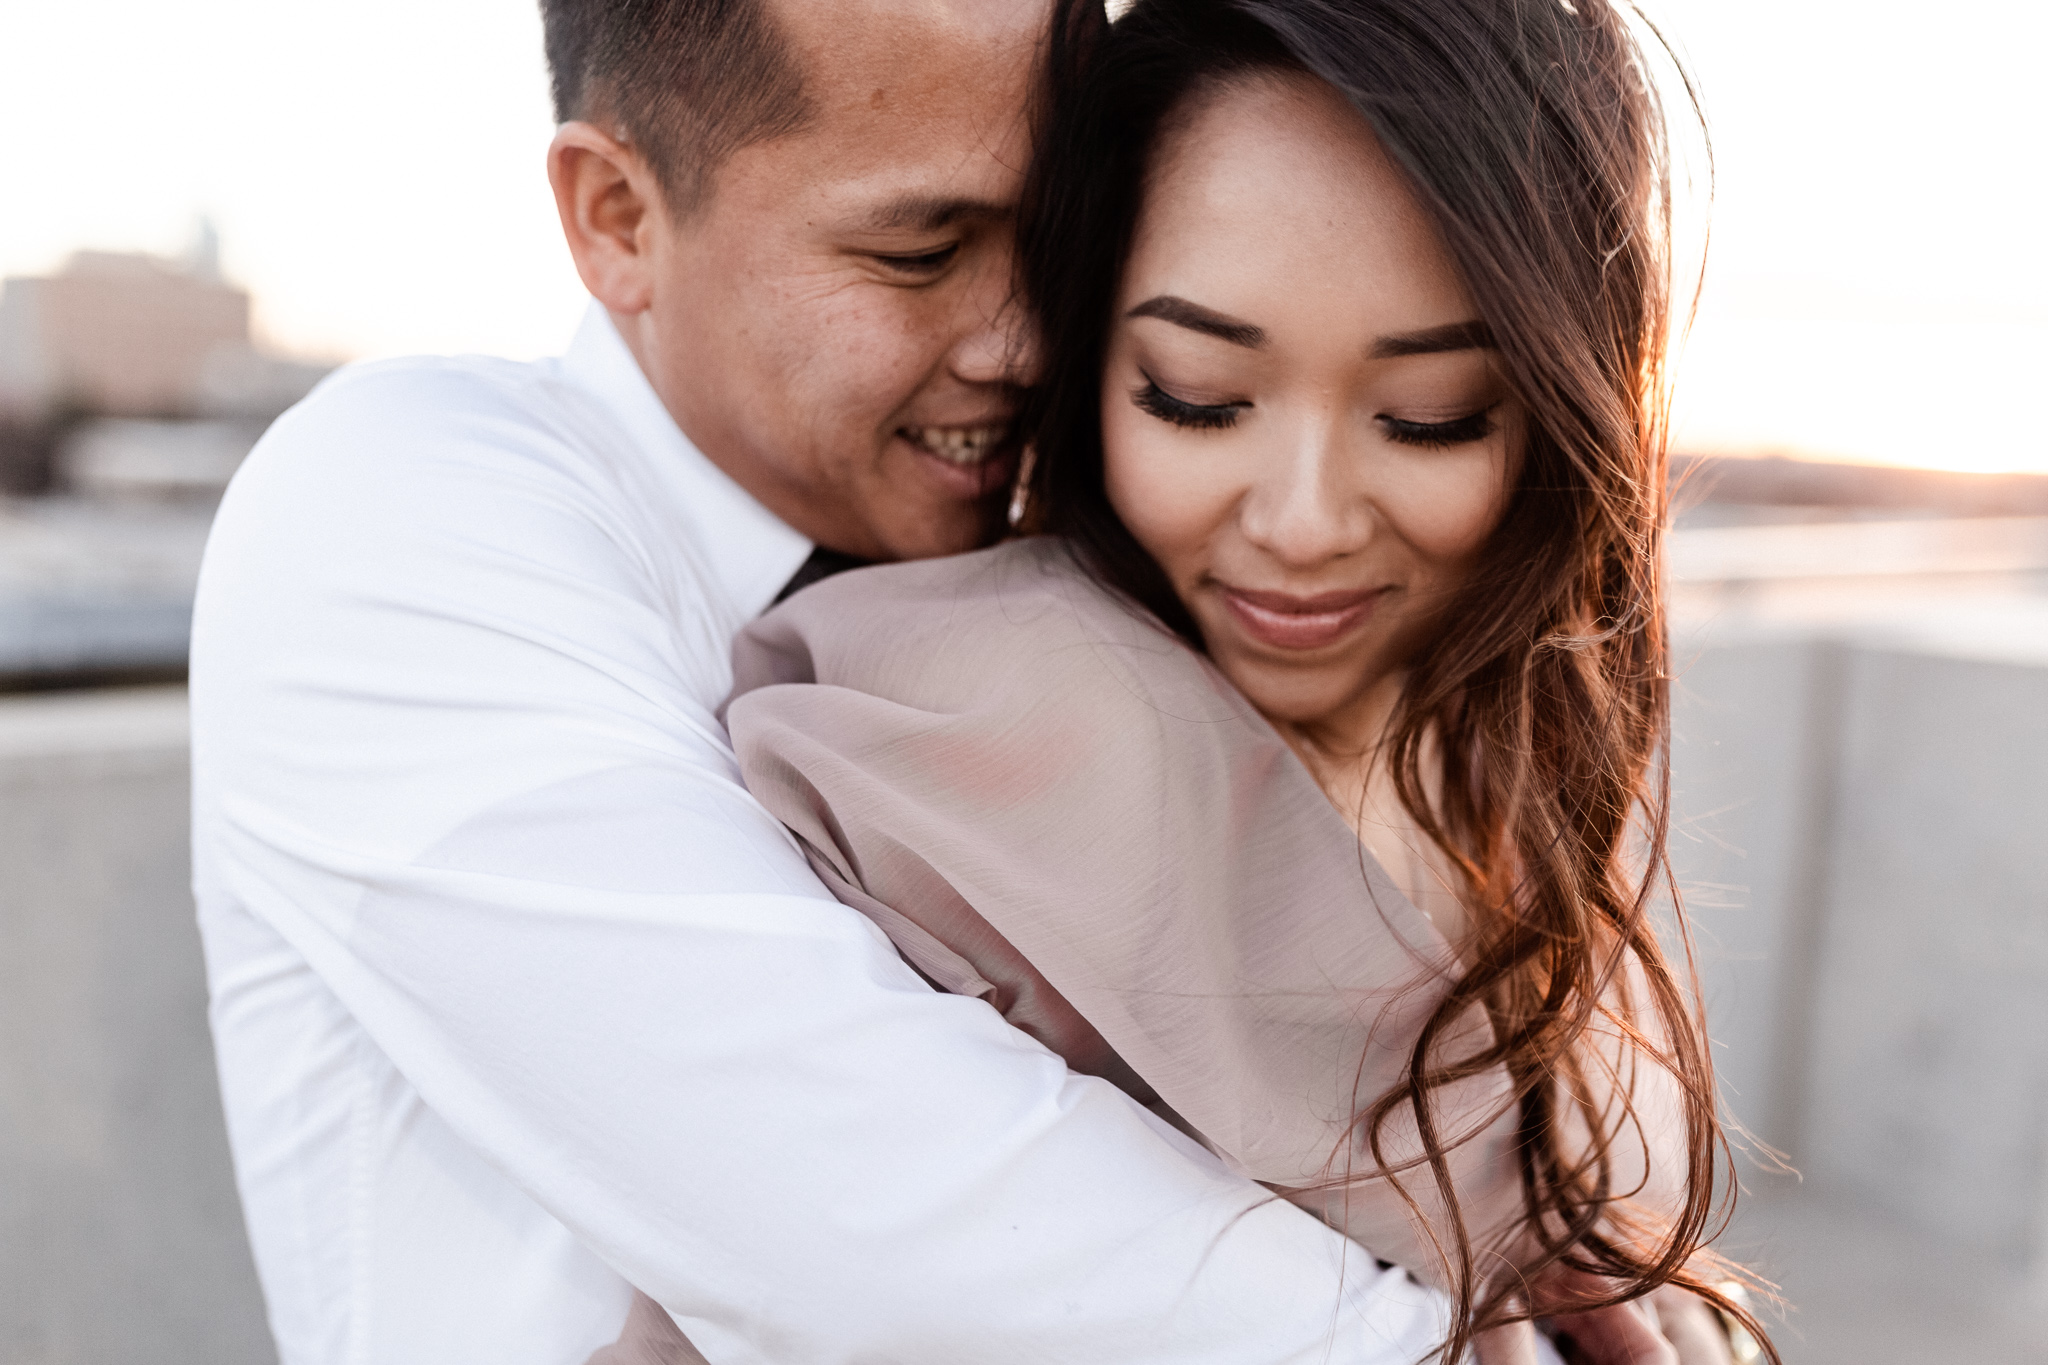 Hieu + Teresa | Colorful Romantic Downtown Engagements | Oklahoma Wedding Photographer-73.jpg